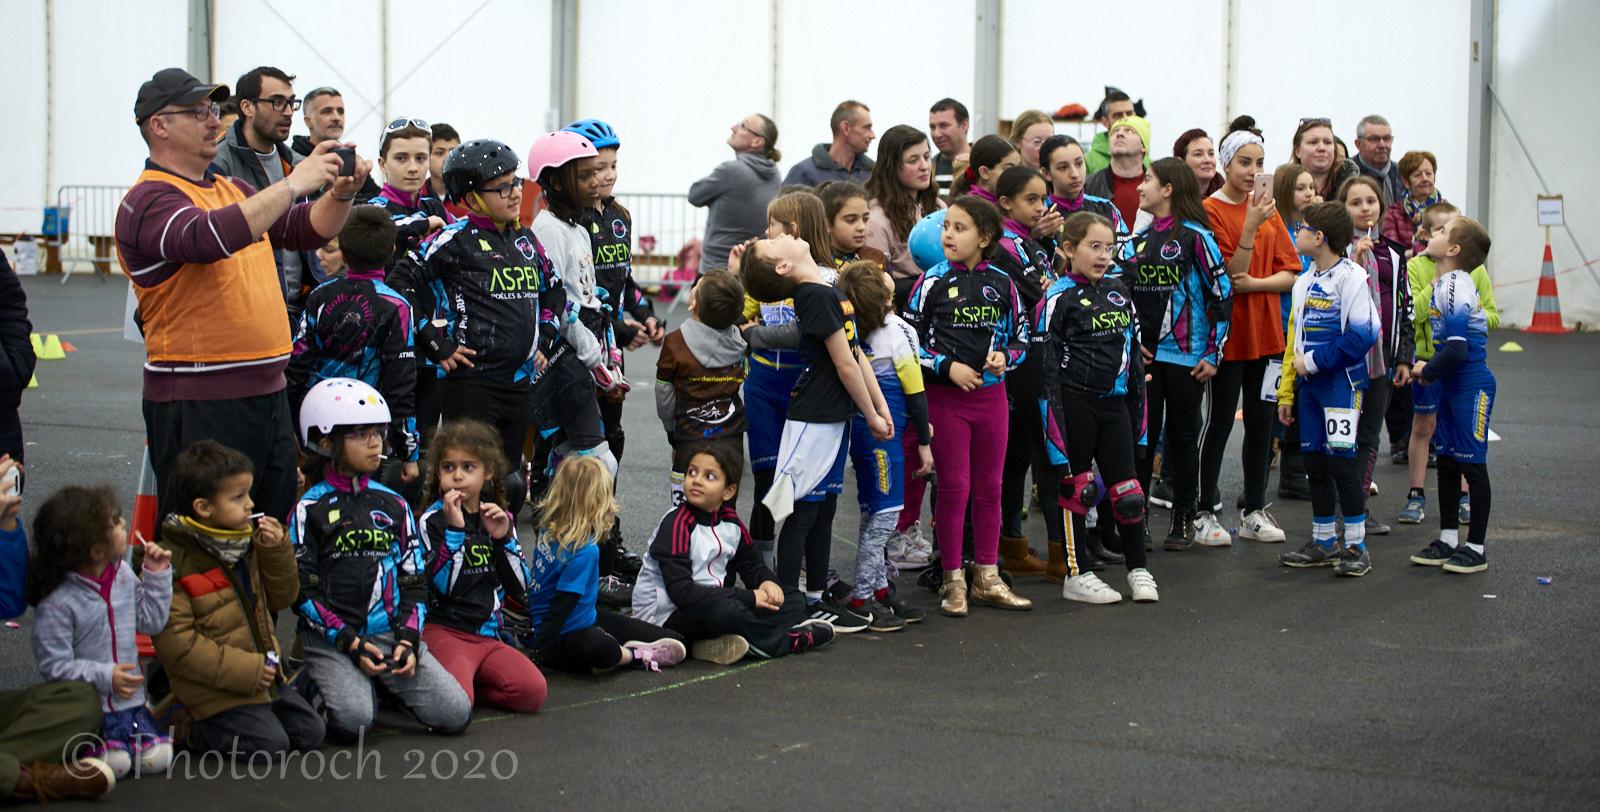 009 Kid's Roller au Villeventus 29 février 2020